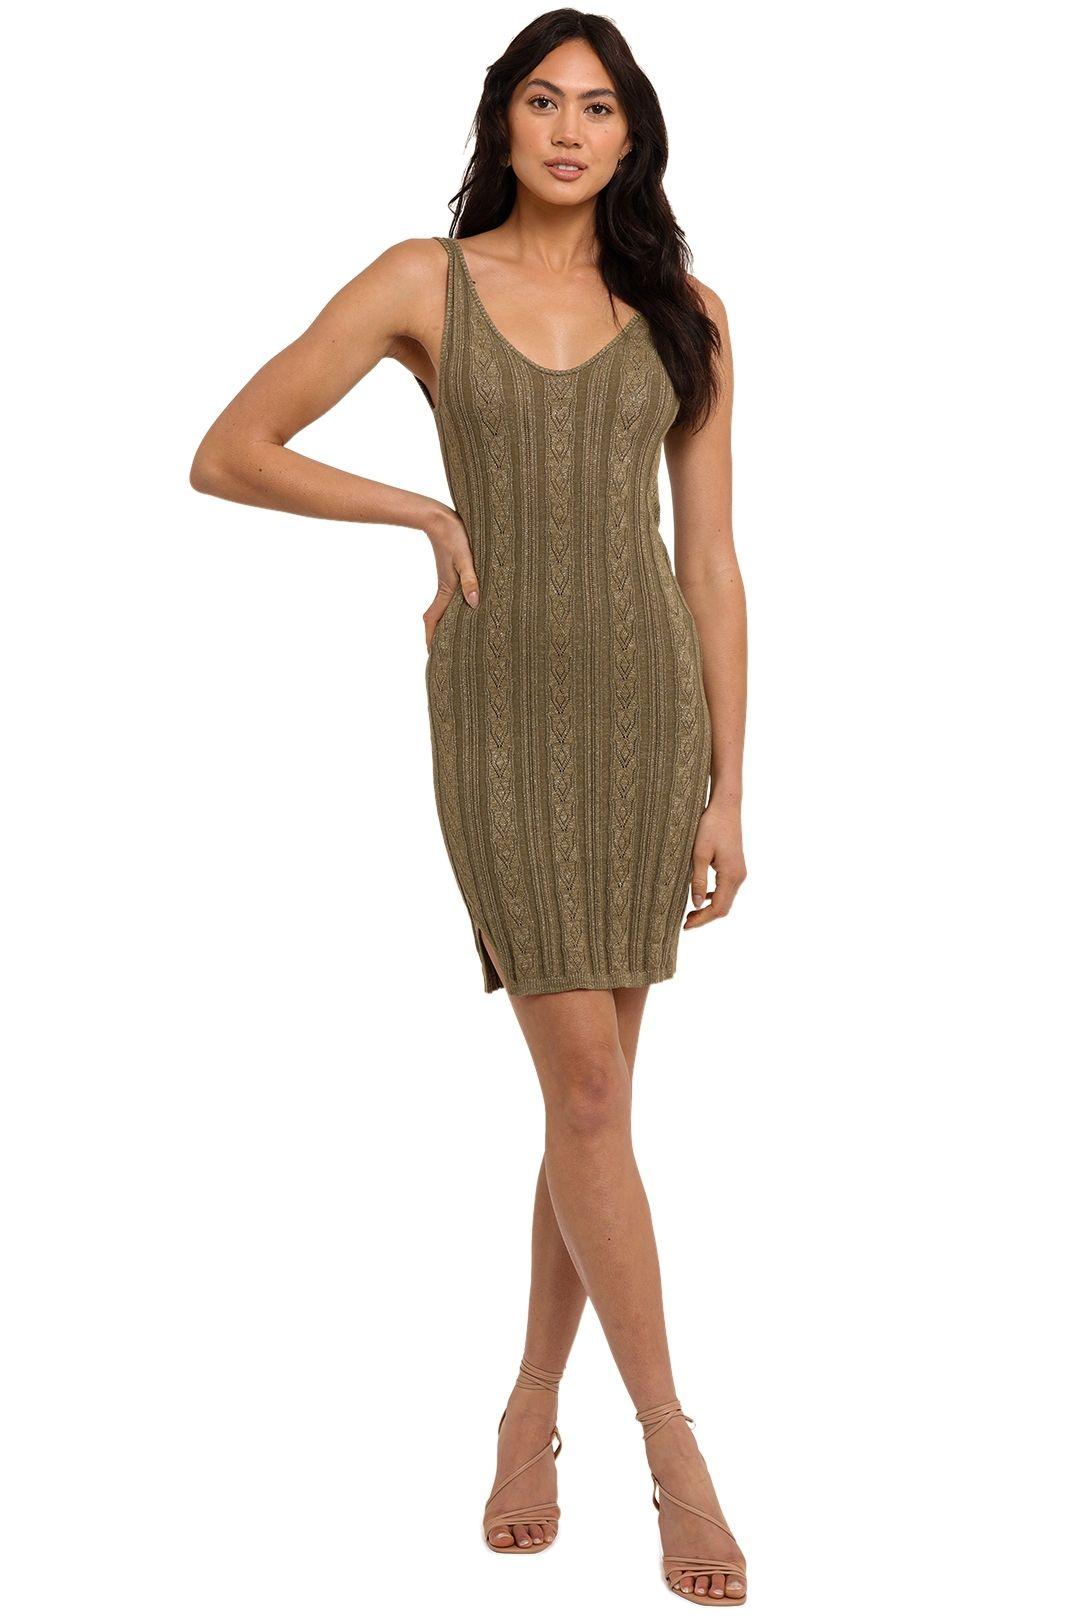 Spell Frenchie Rib Mini Dress Khaki